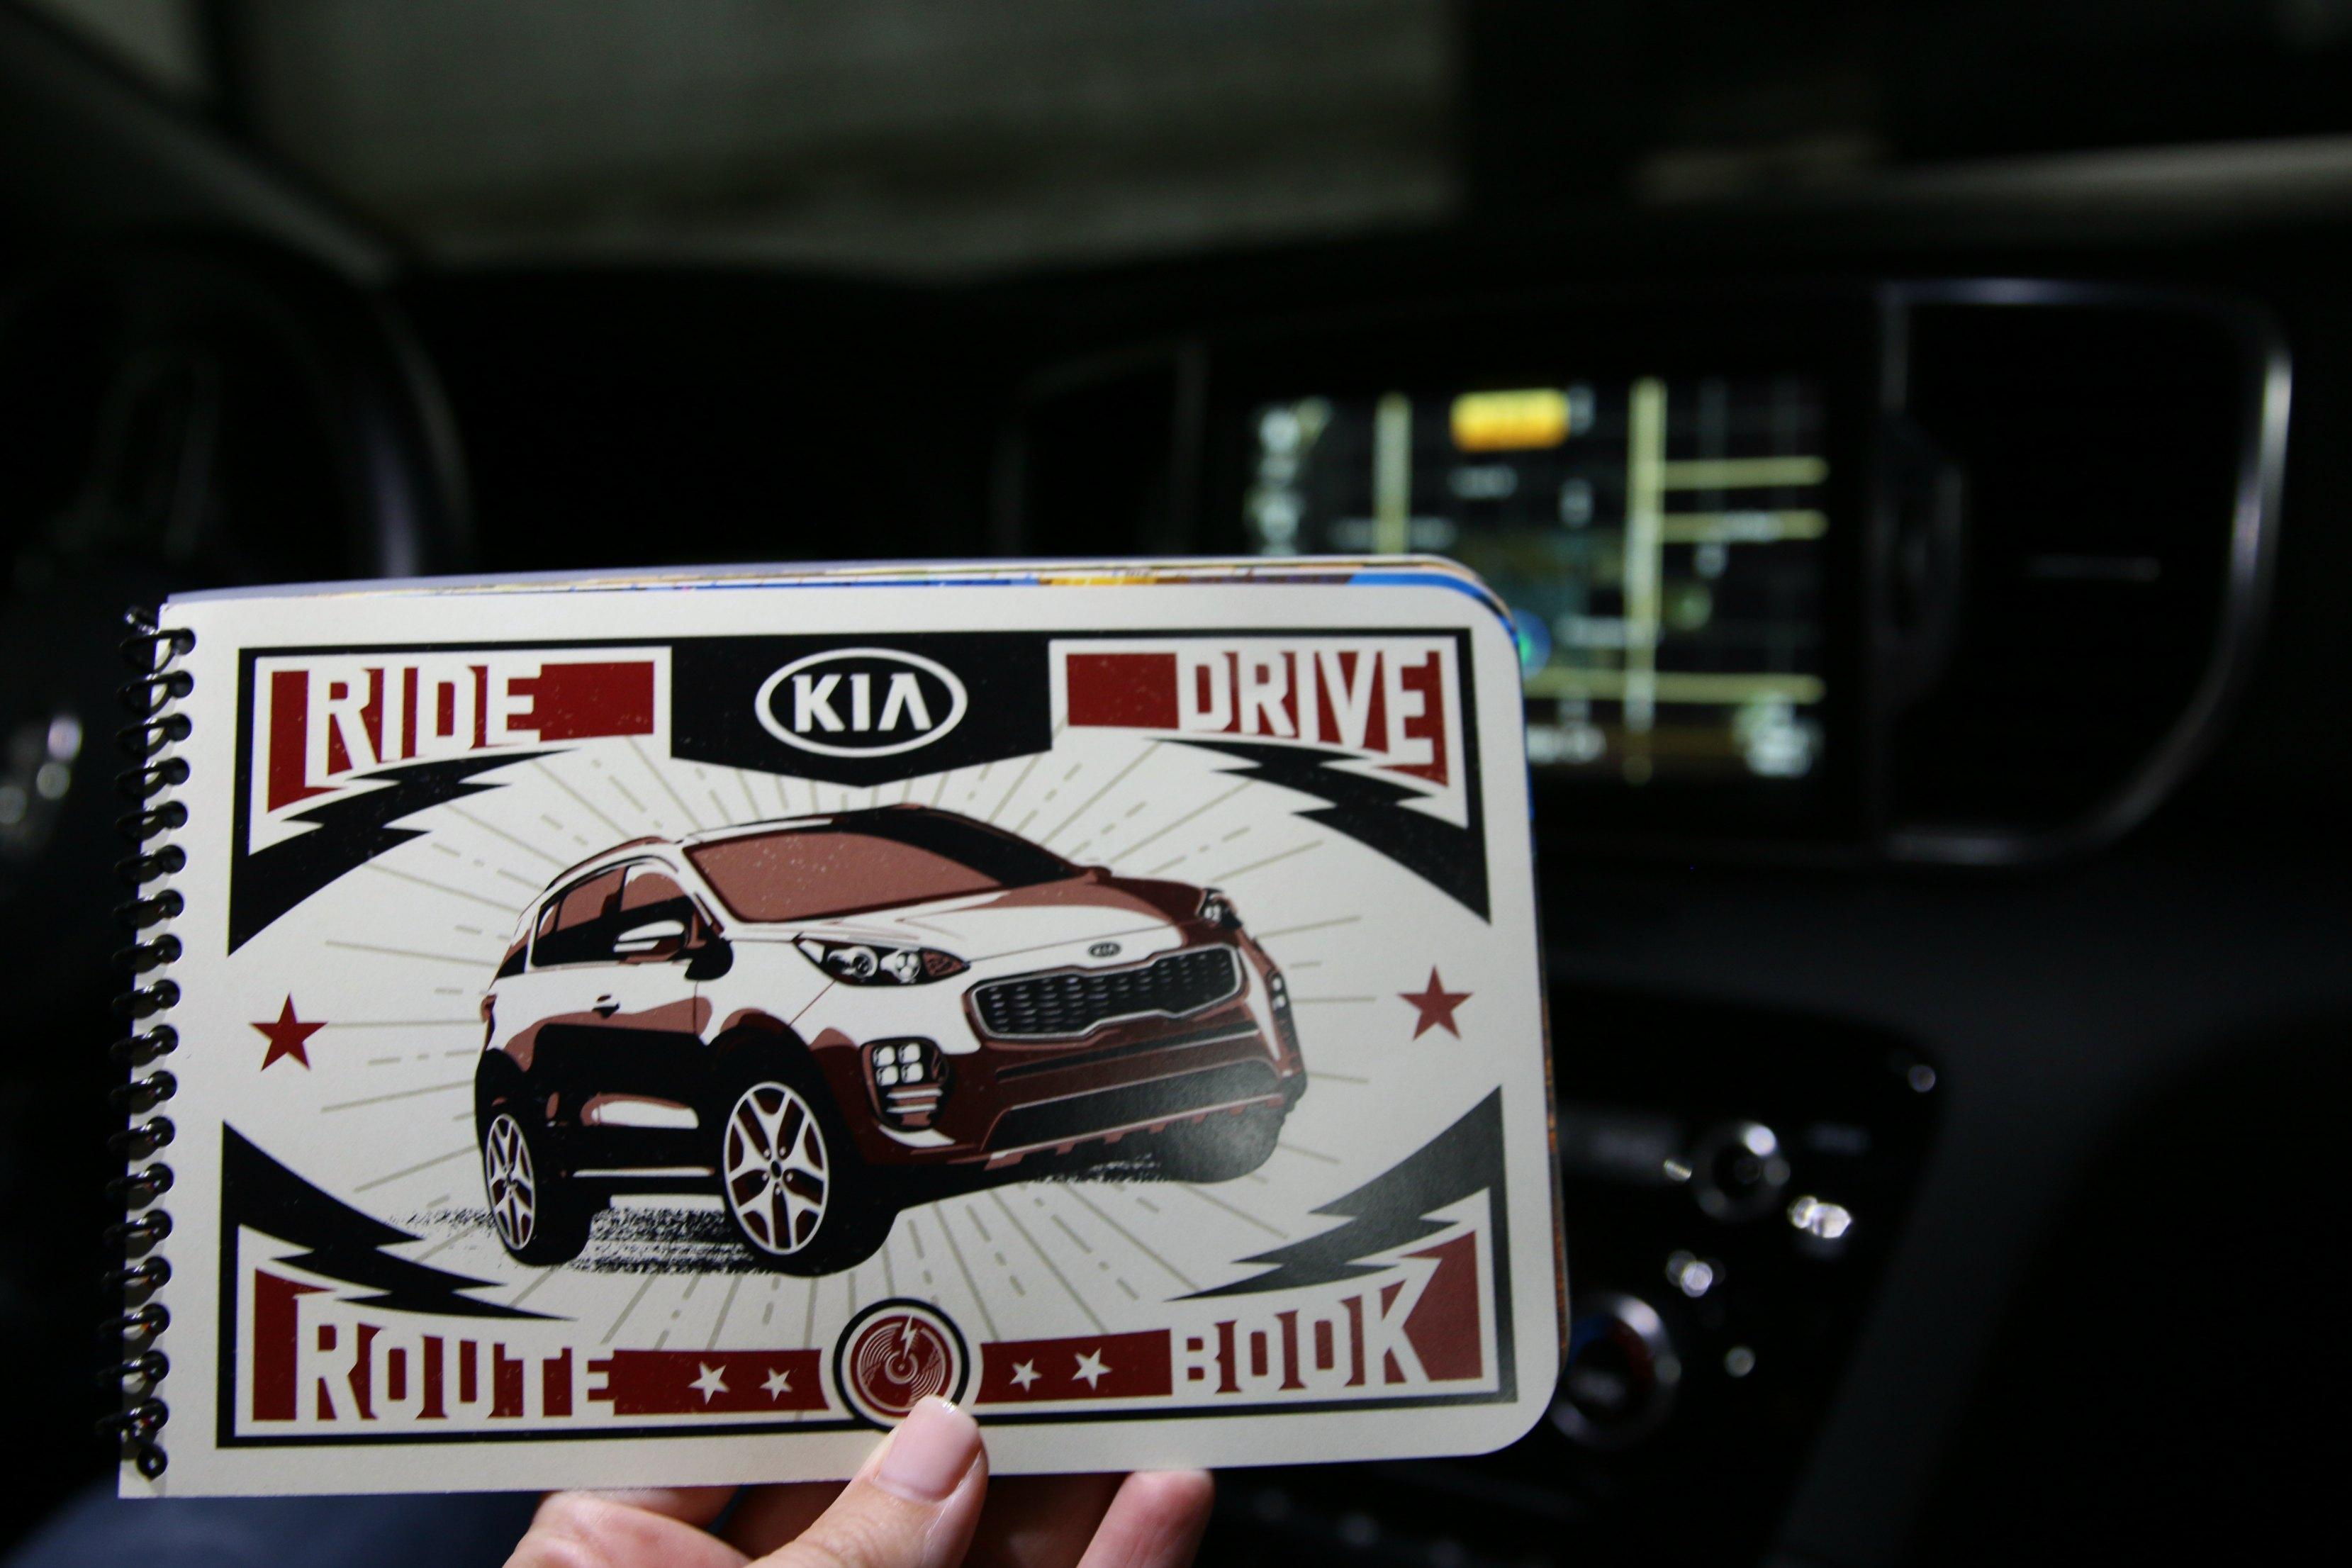 kia ride and drive event